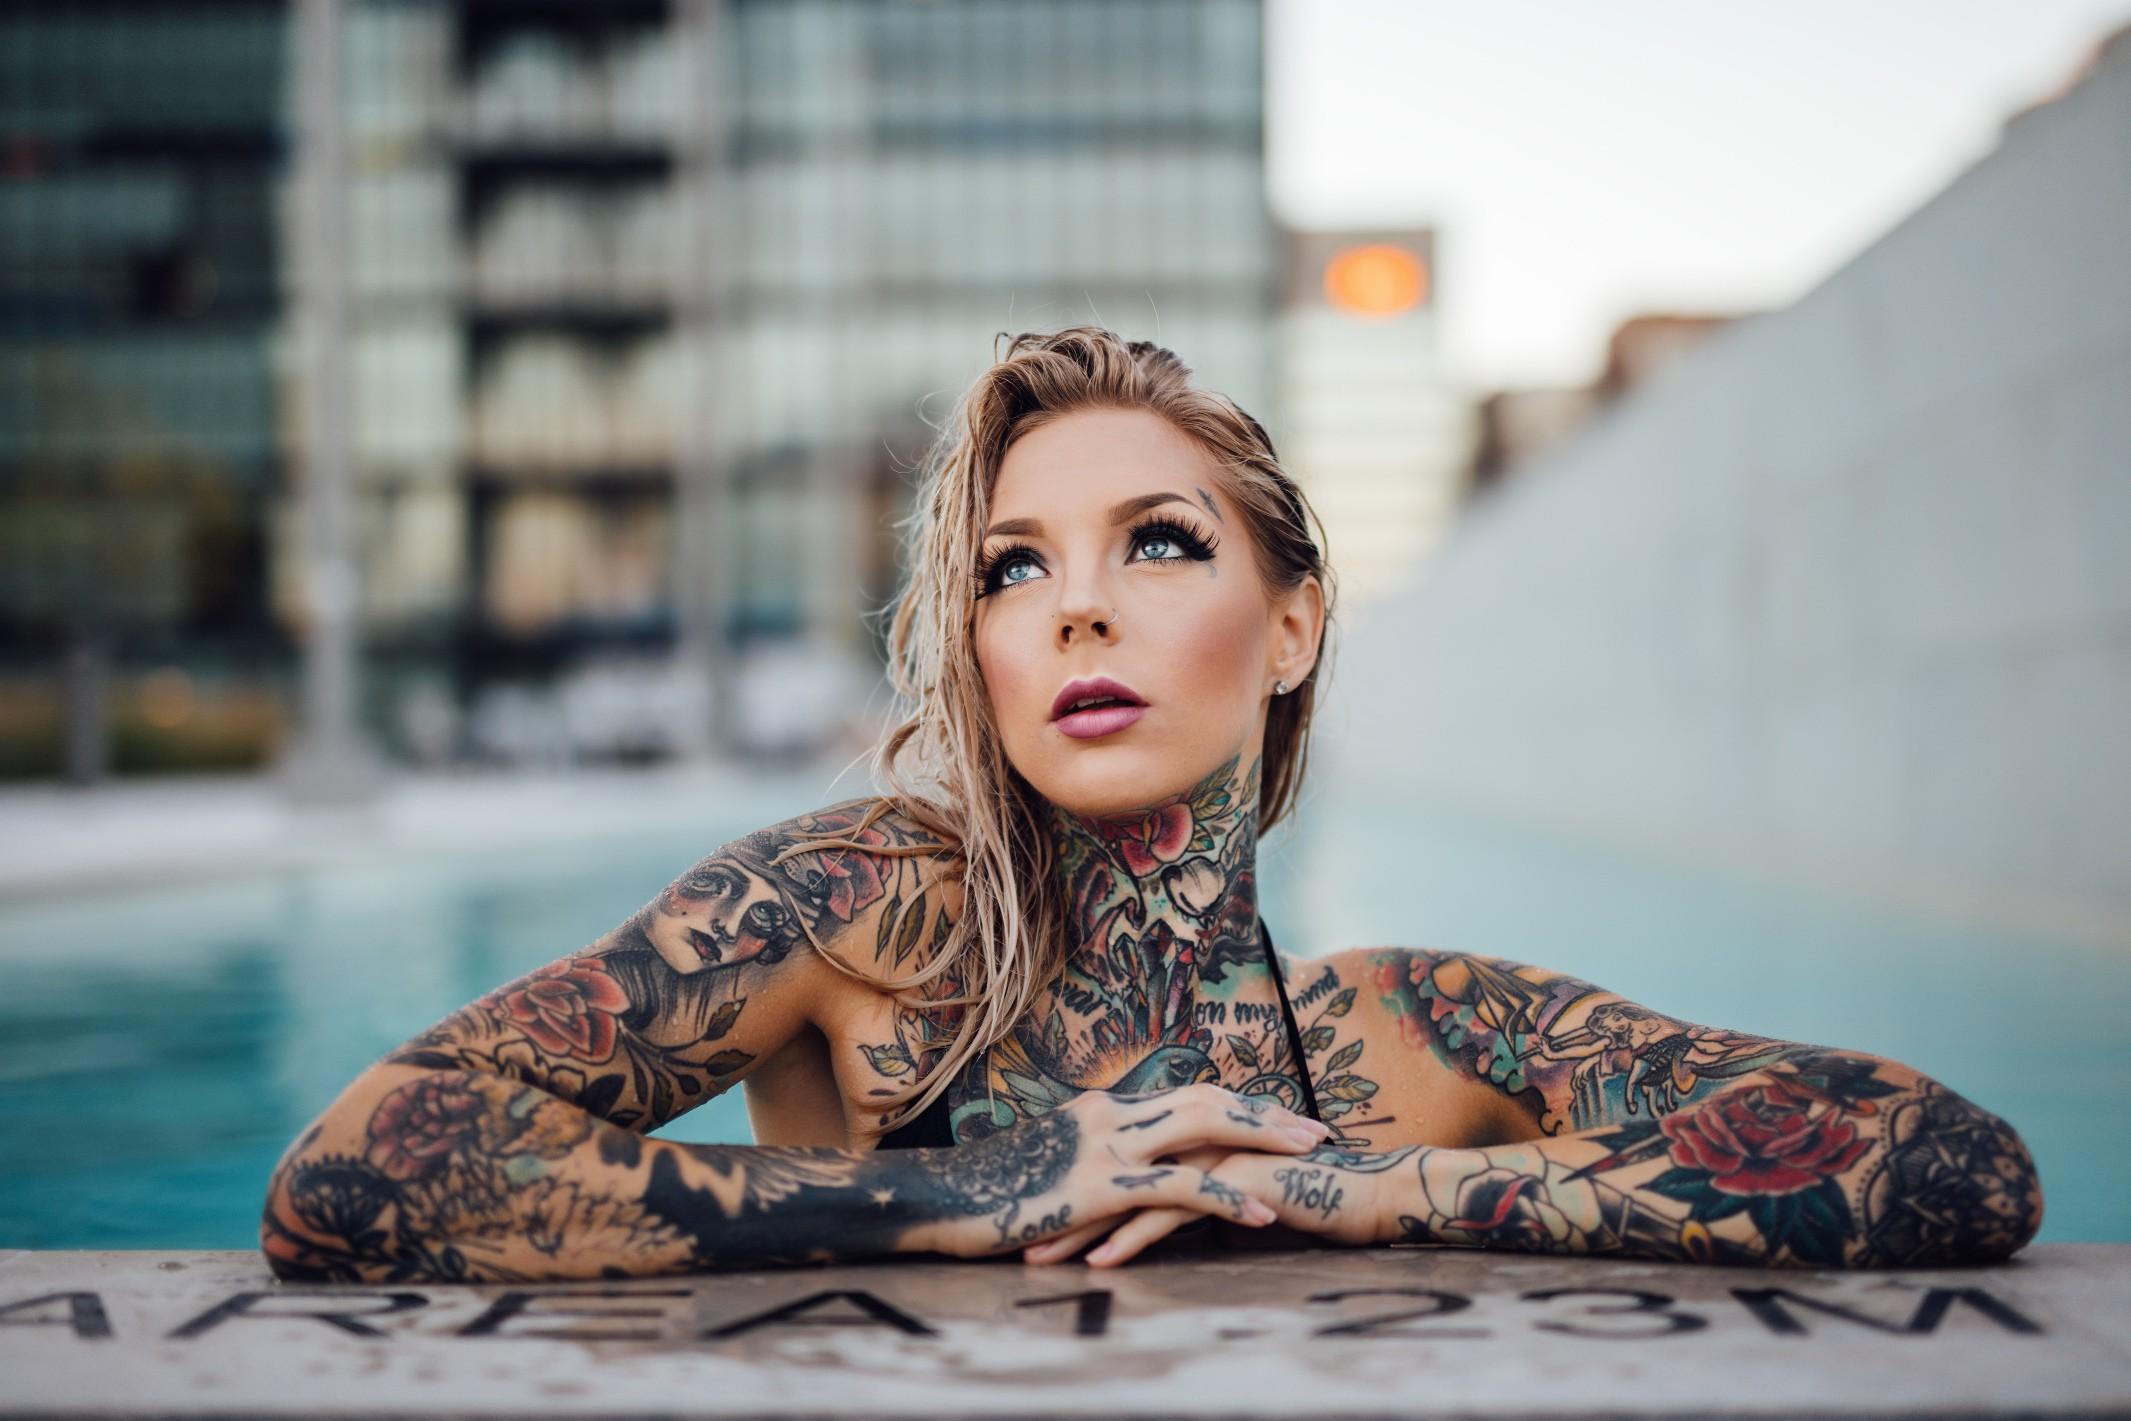 Tattoo Bikini: Wallpaper : Nose Rings, Sitting, Tattoo, Swimming Pool